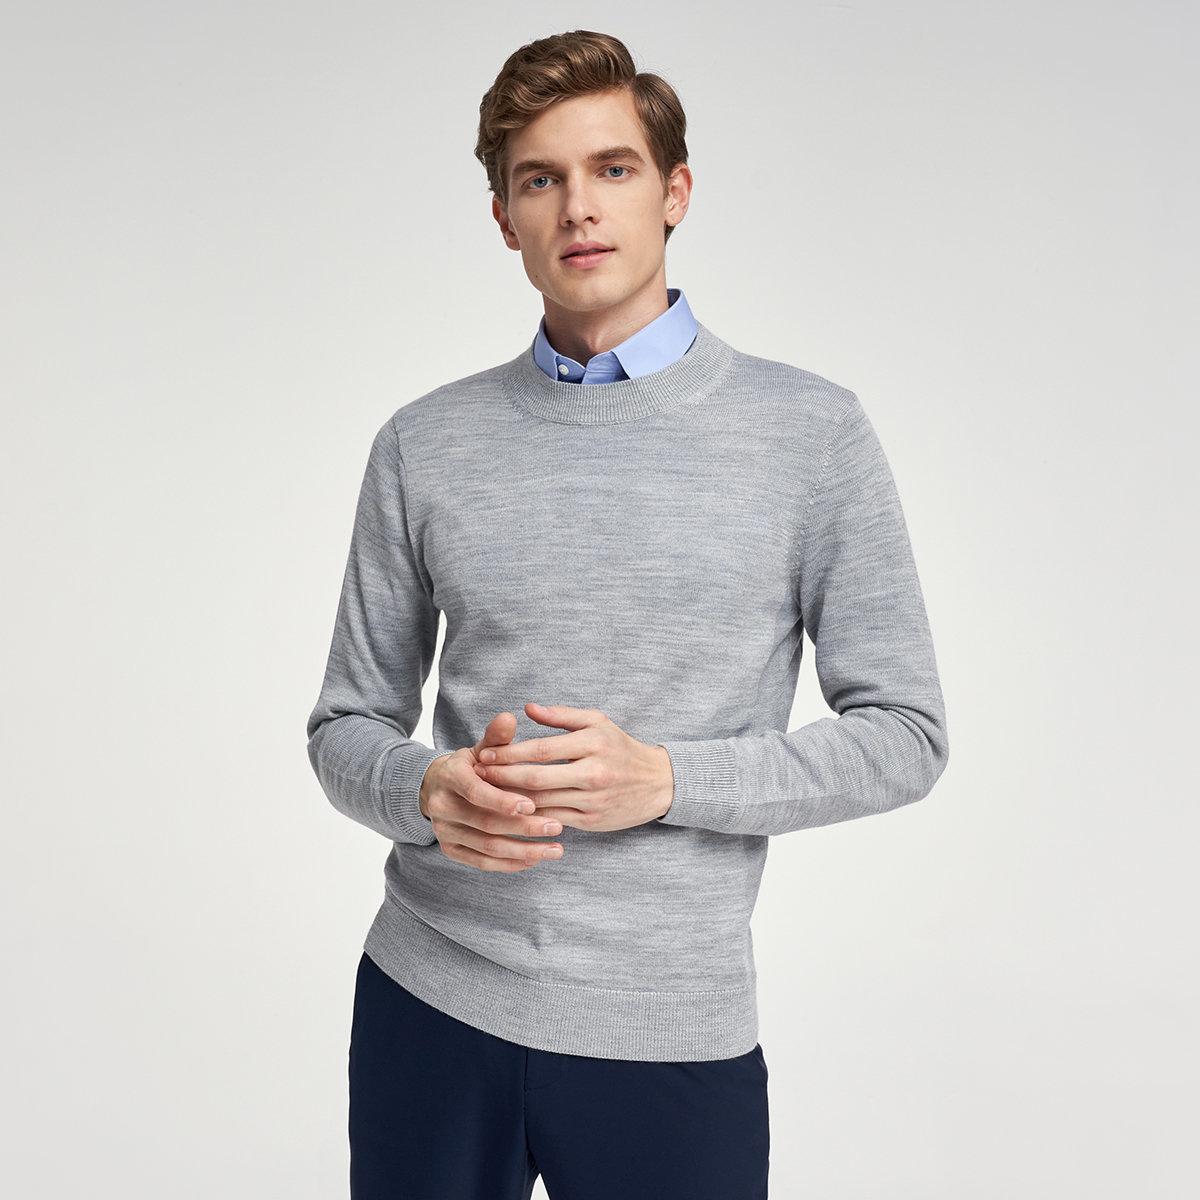 MEN'S SWEATER(gray)